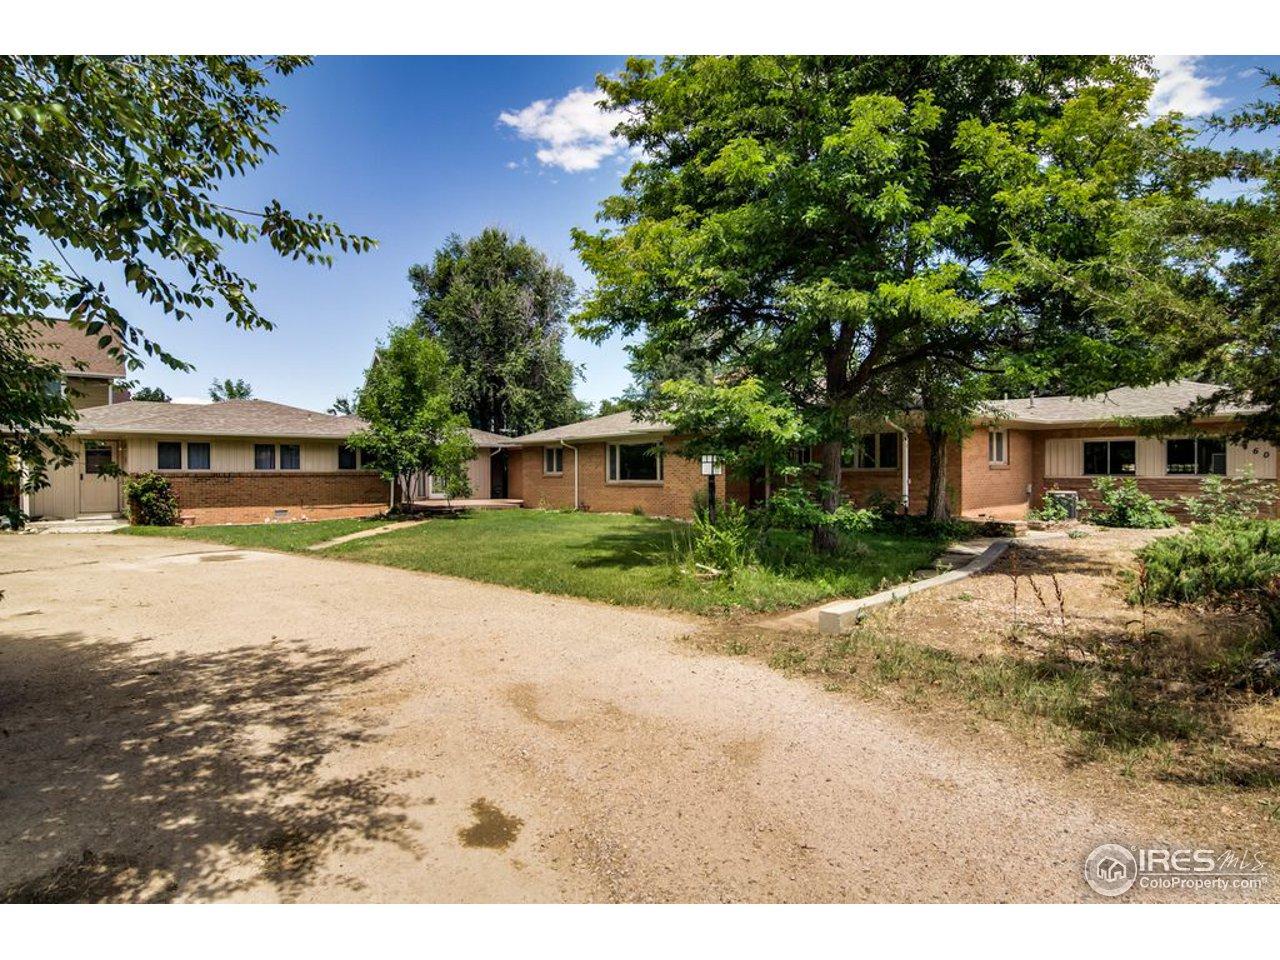 1460 55th St, Boulder CO 80303